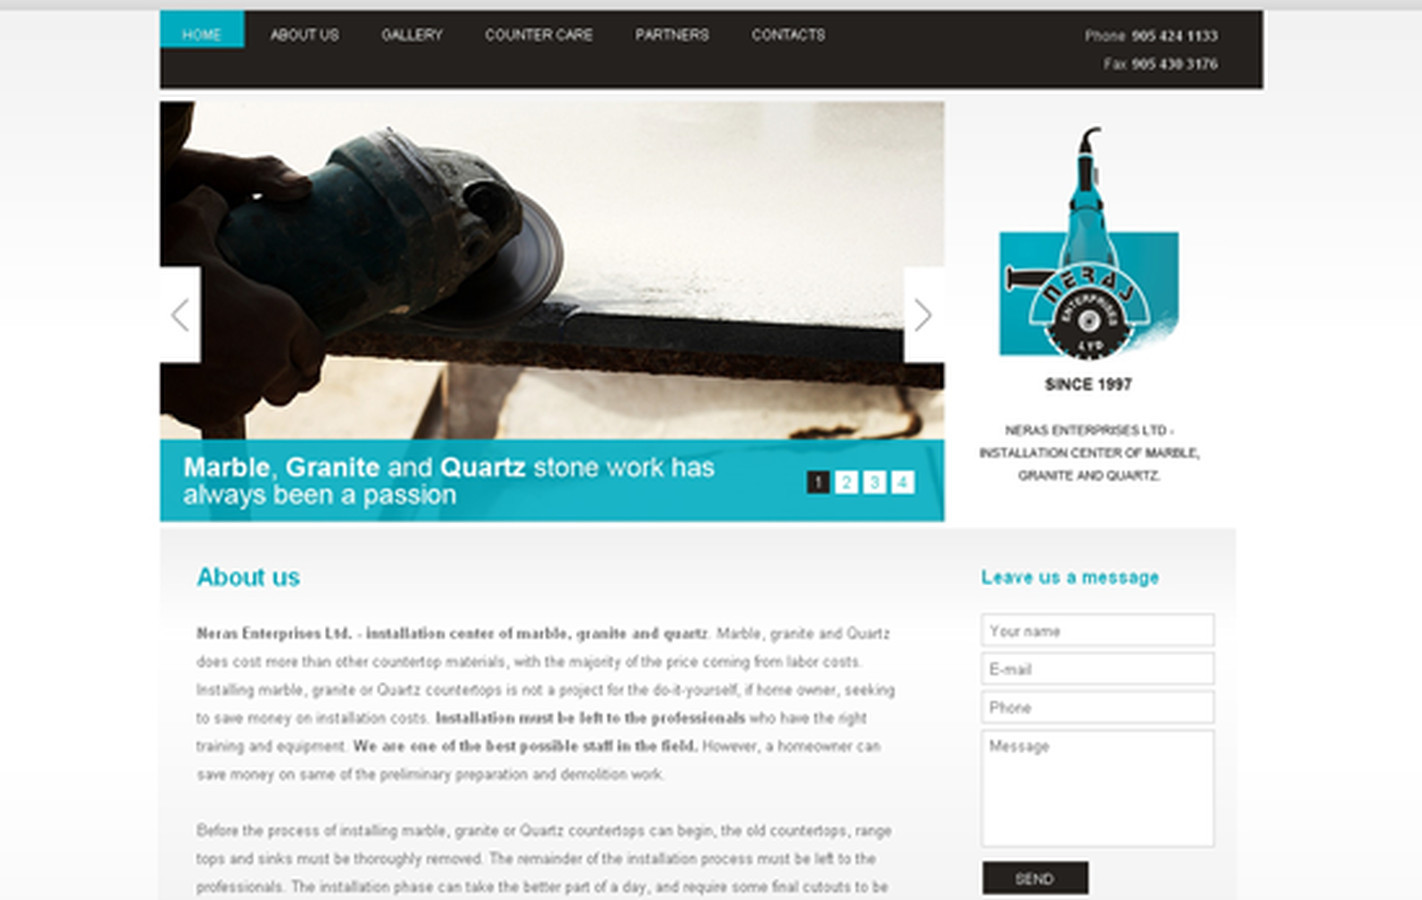 www.nerasenterprises.com